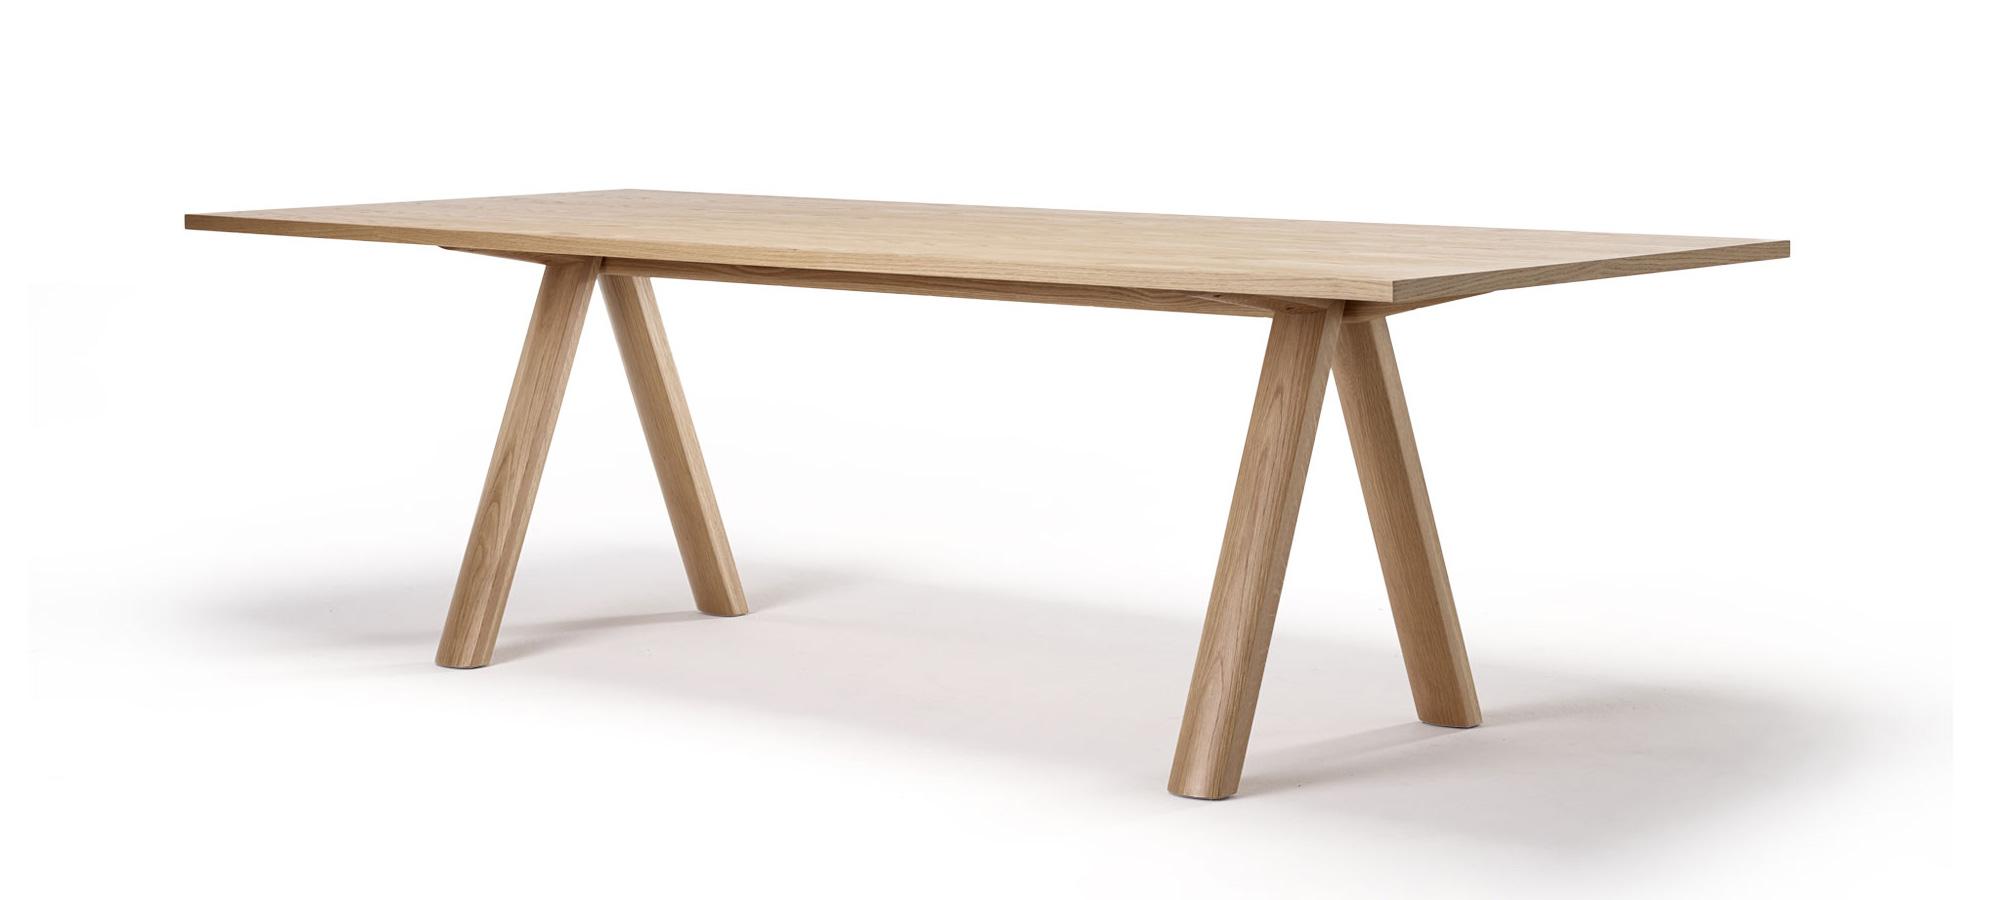 marcel sigel | plateau tables